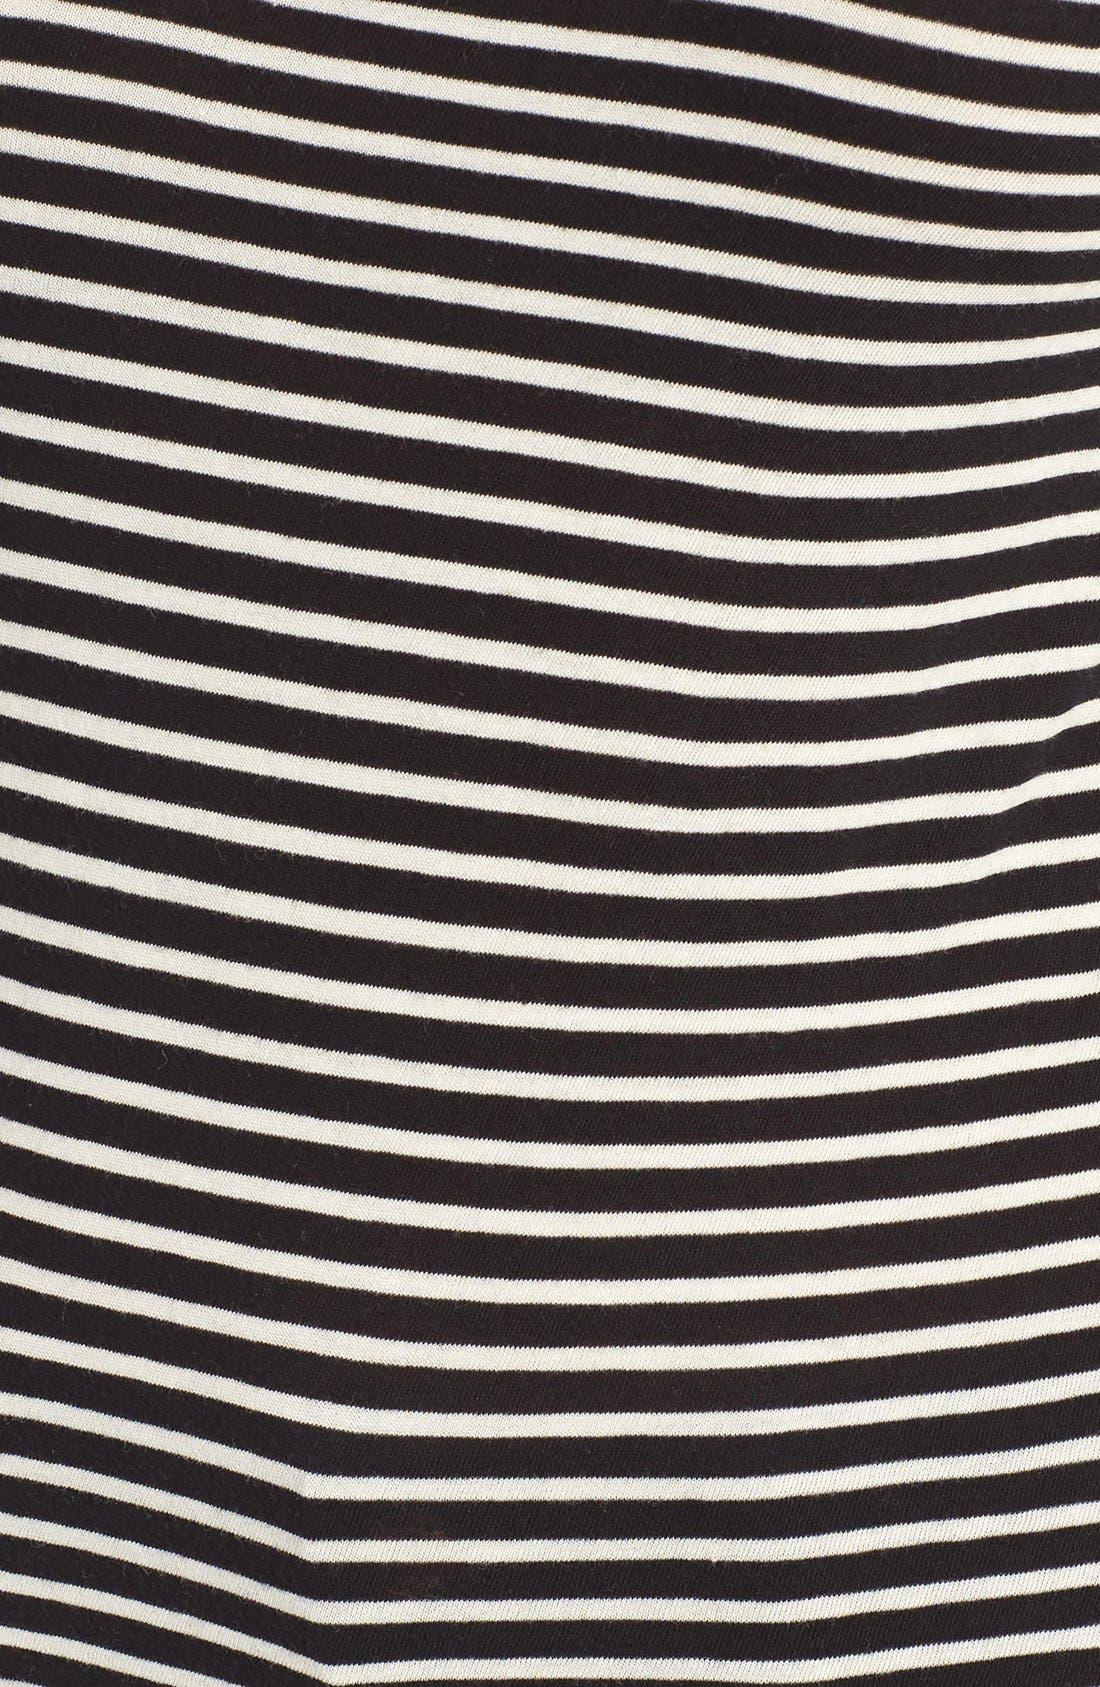 J.Crew Stripe Tissue Turtleneck Tee,                             Alternate thumbnail 5, color,                             Black Ecru